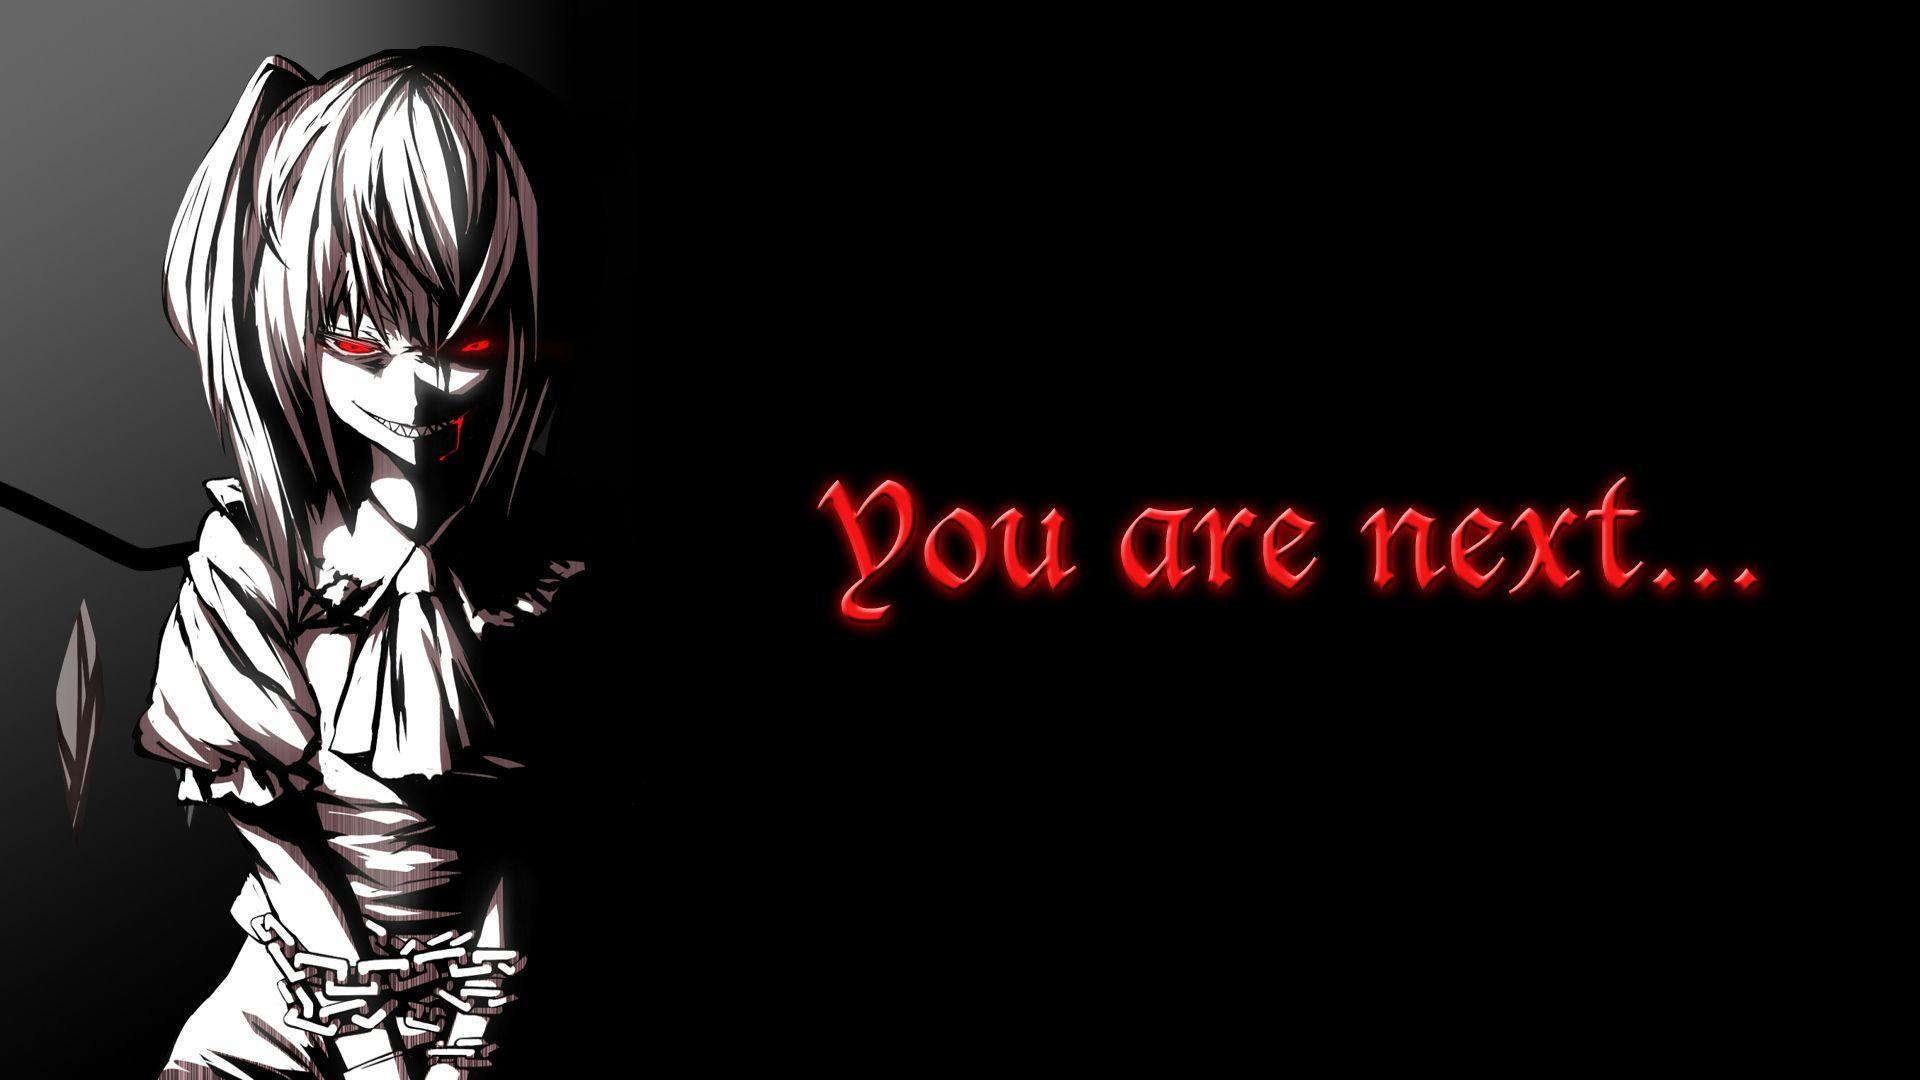 25 Gambar Anime Psikopat Sadis Hd Terbaik Gambar Anime Keren Terlengkap